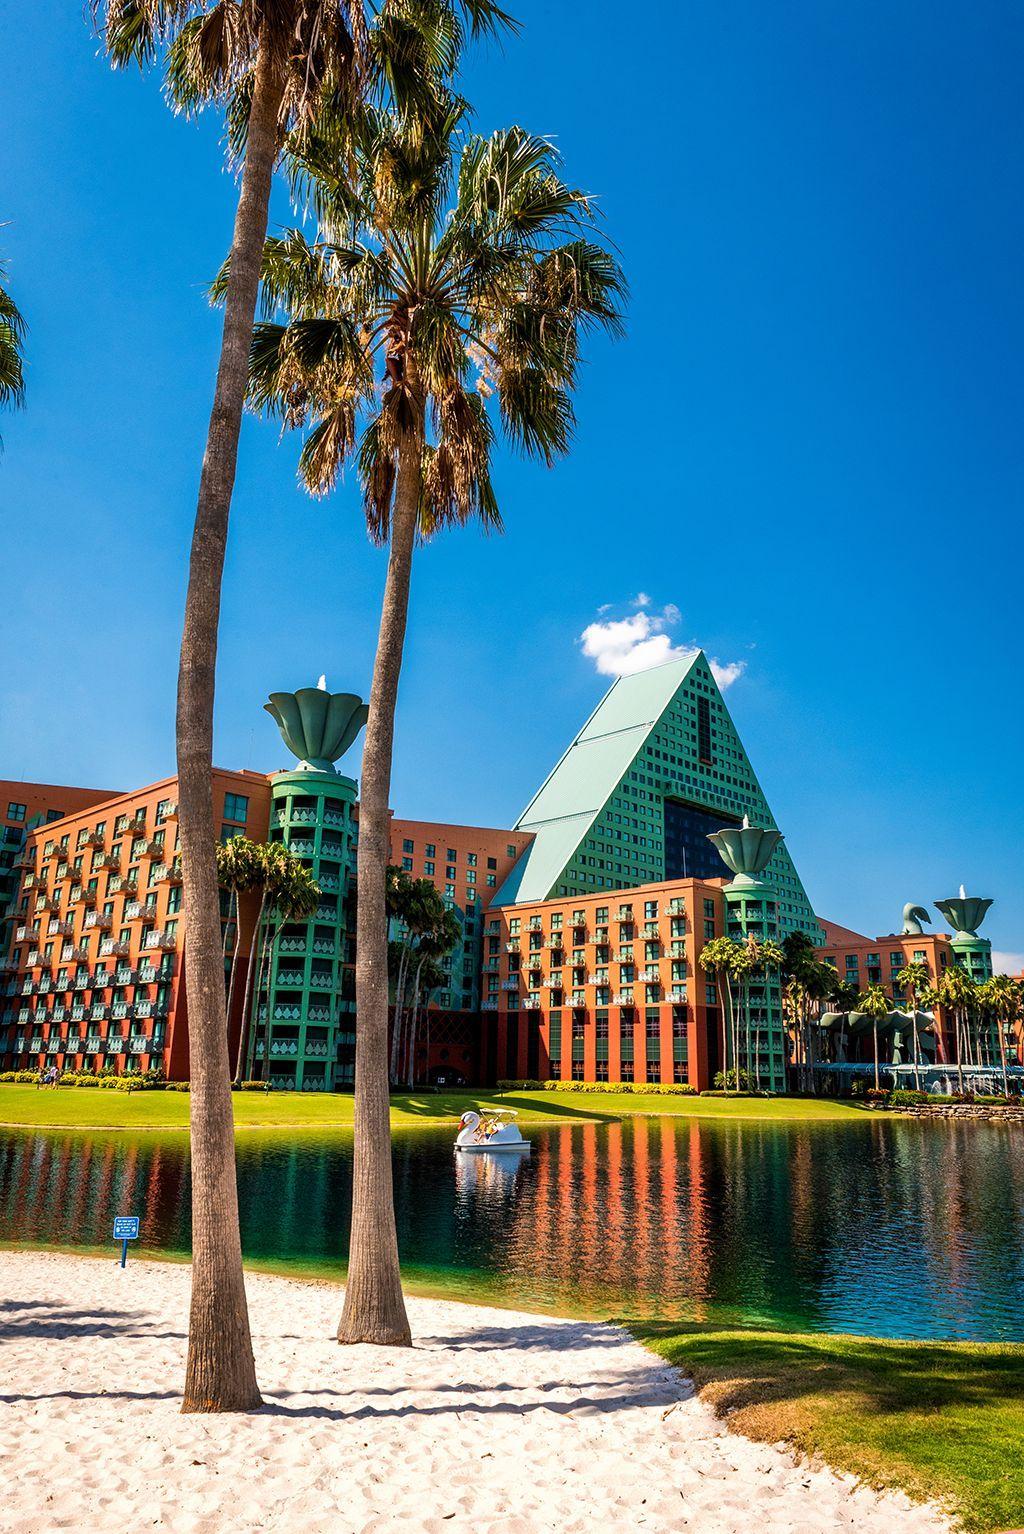 Top 10 Off Site Hotels Near Disney World